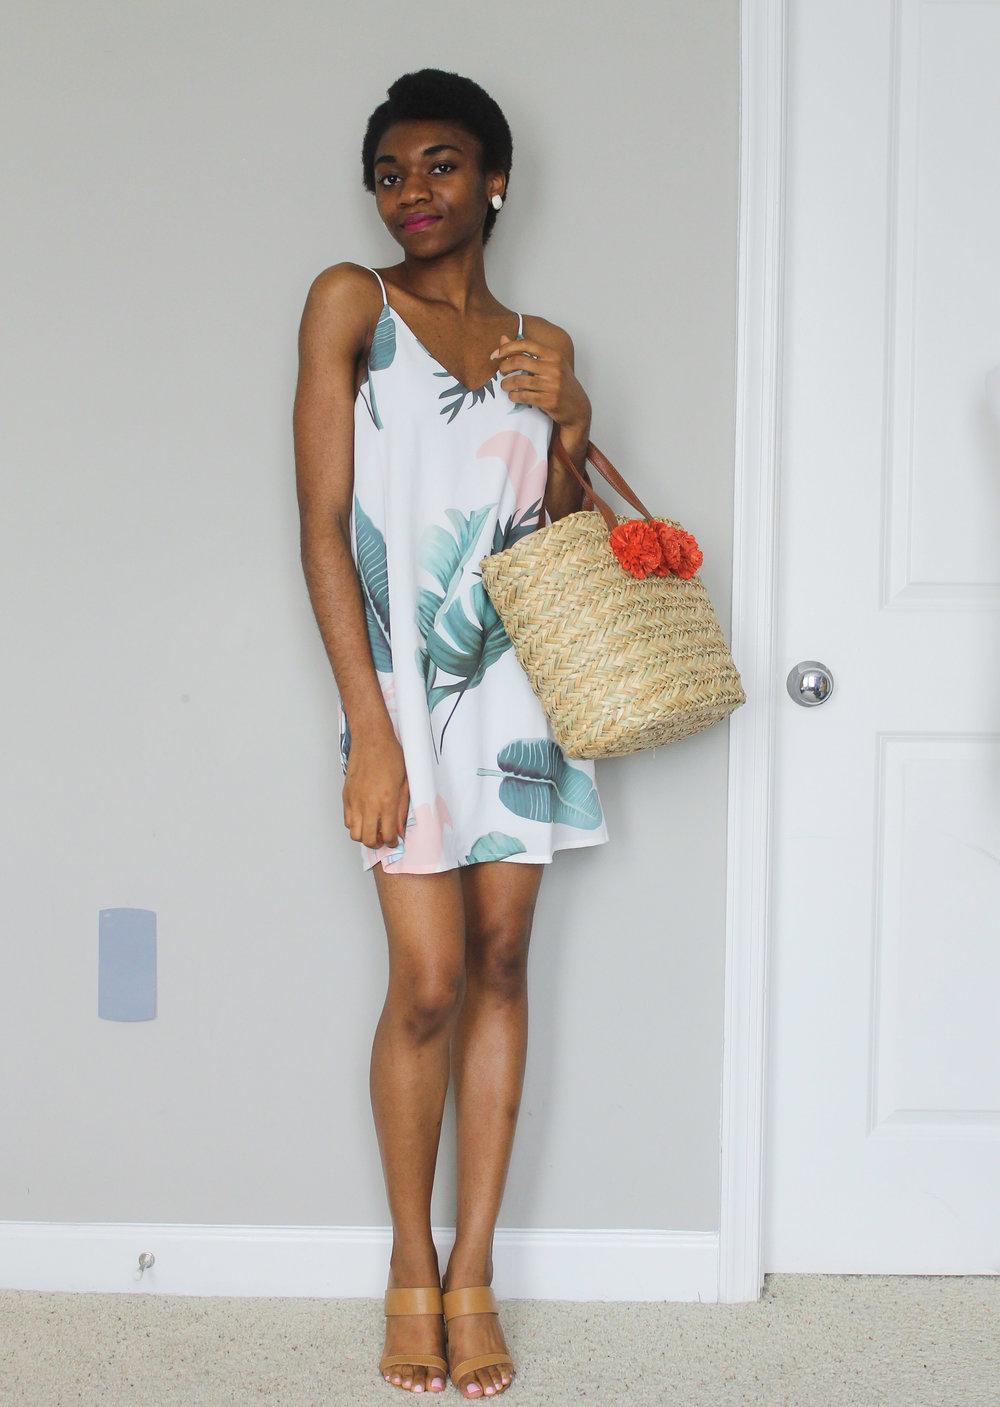 4WaystoWear-tropical-prints-dress 32.jpg